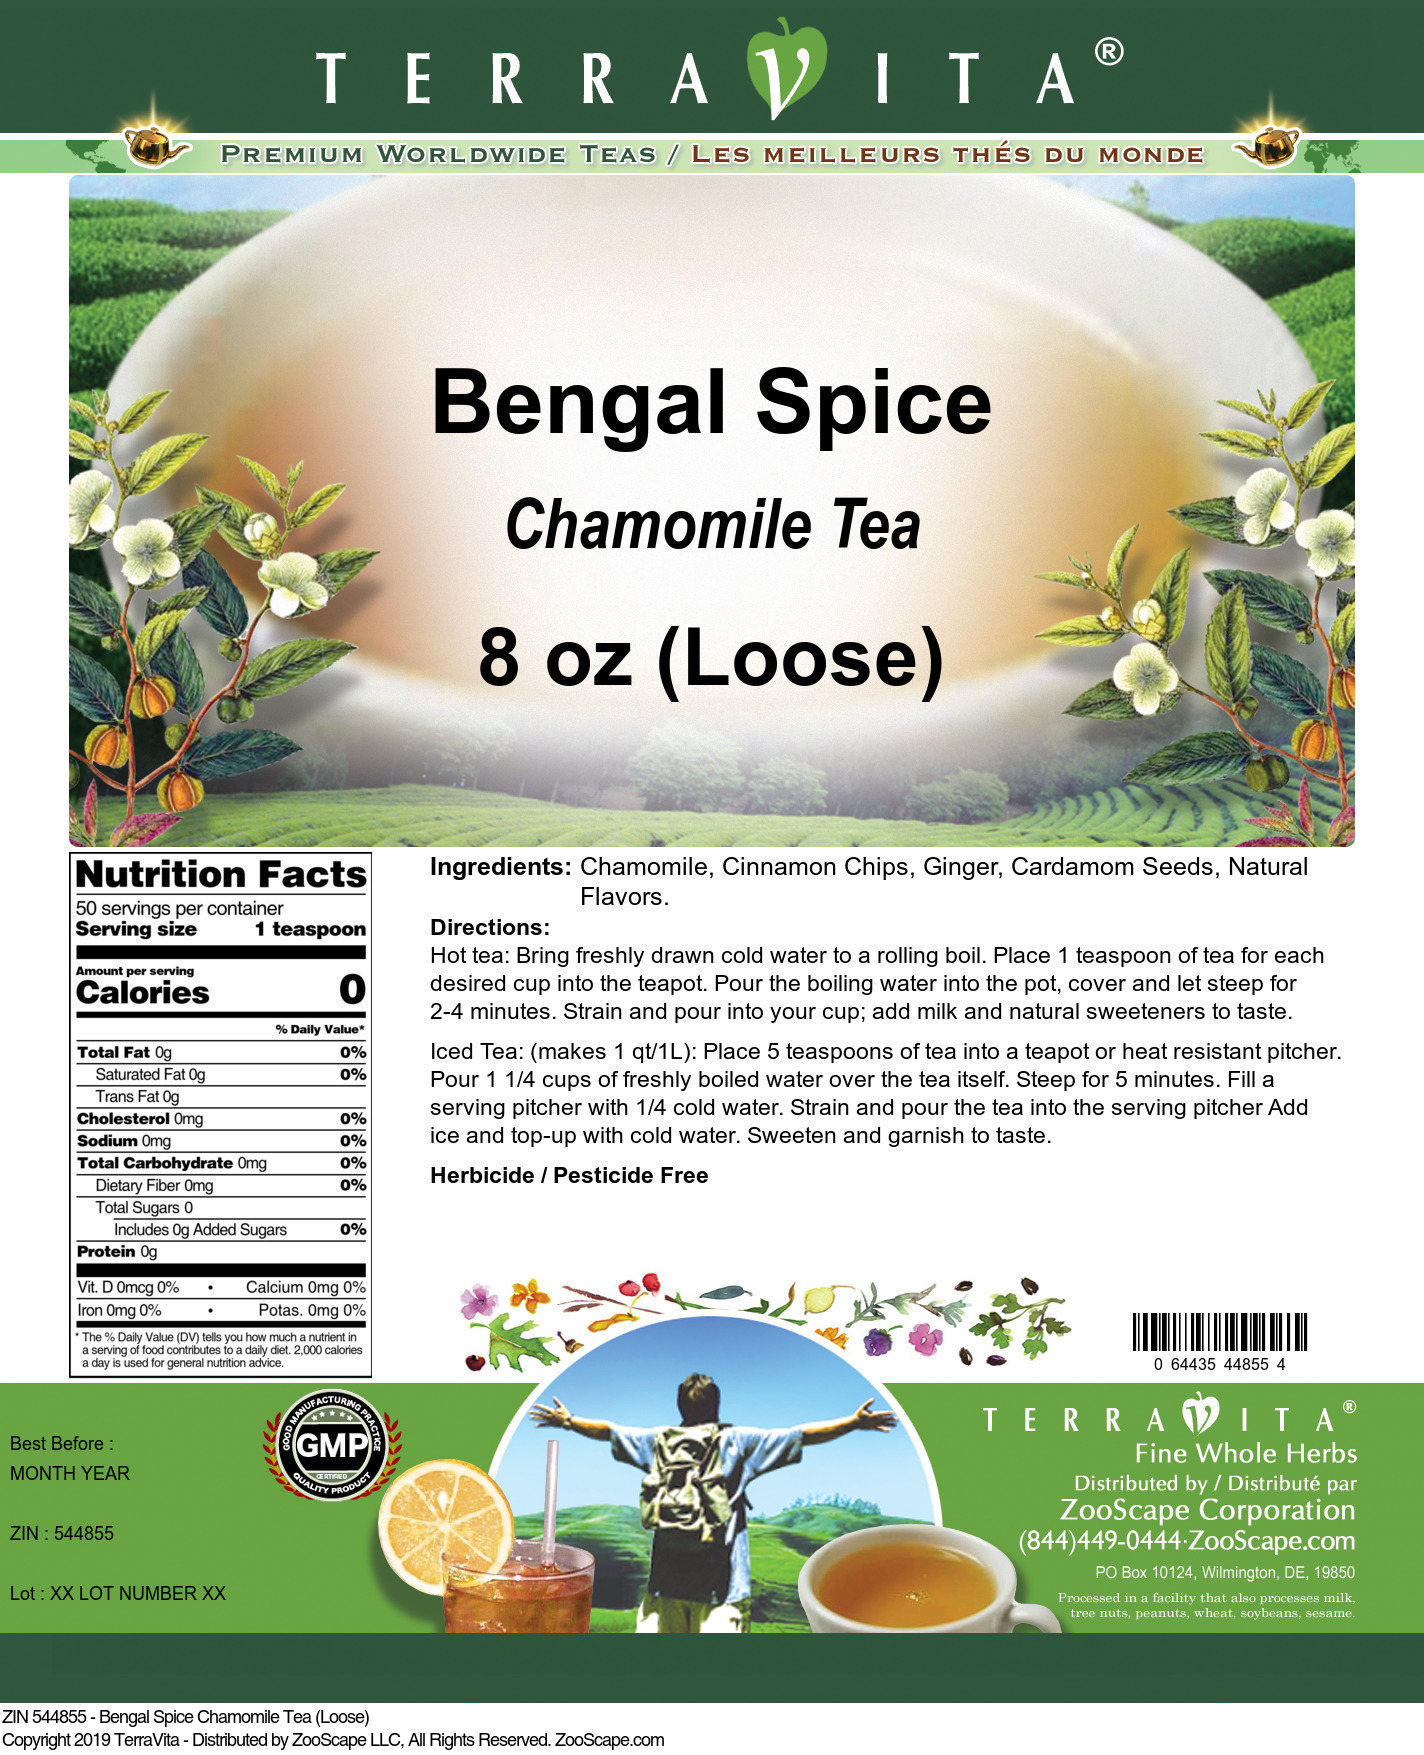 Bengal Spice Chamomile Tea